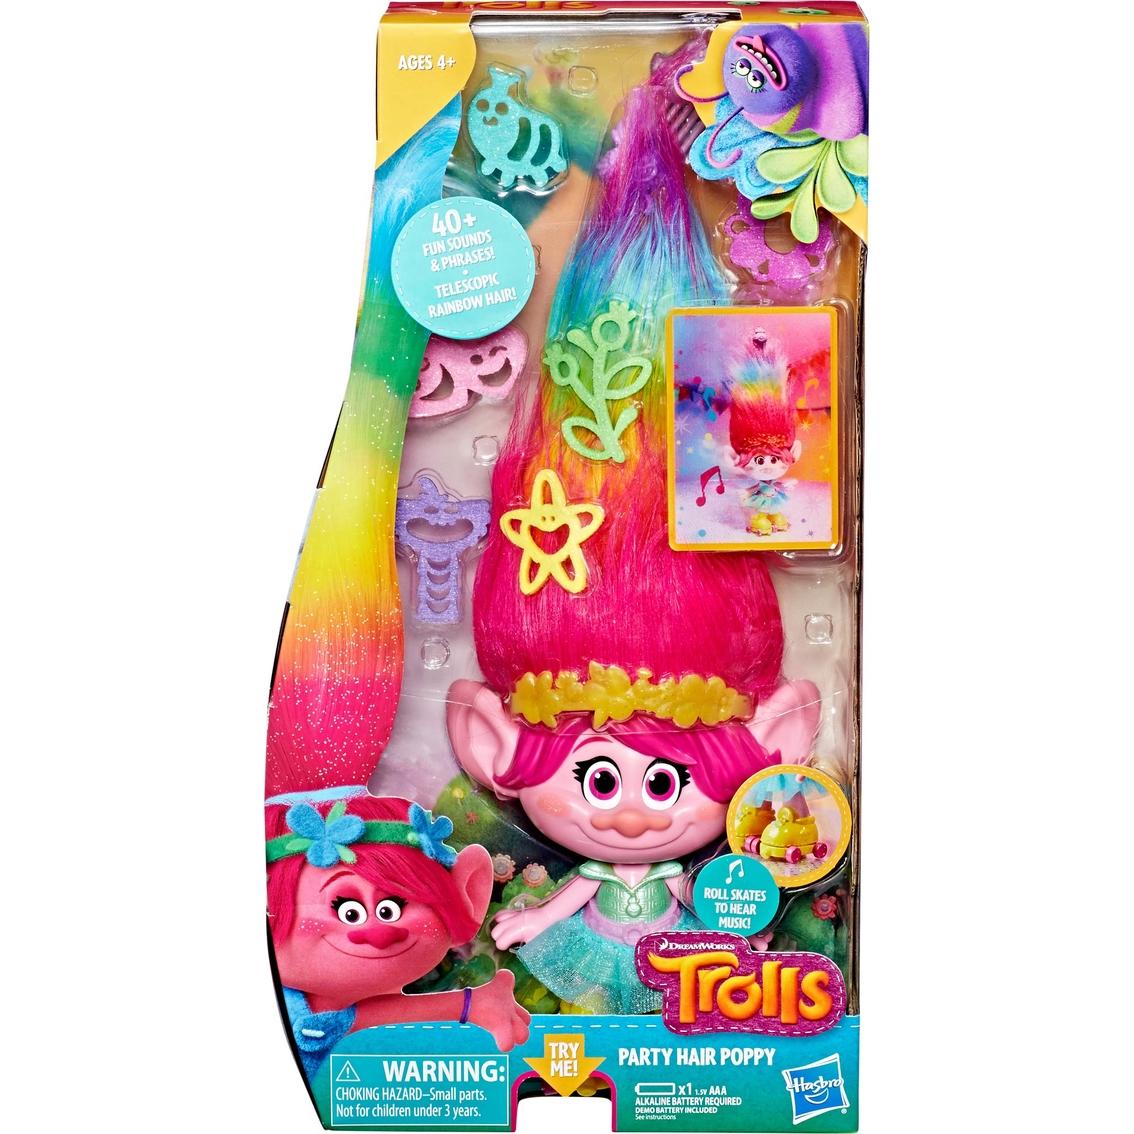 dfc1cb1fe0232 Hasbro Dreamworks Trolls Party Hair Poppy | Dolls | Baby & Toys ...